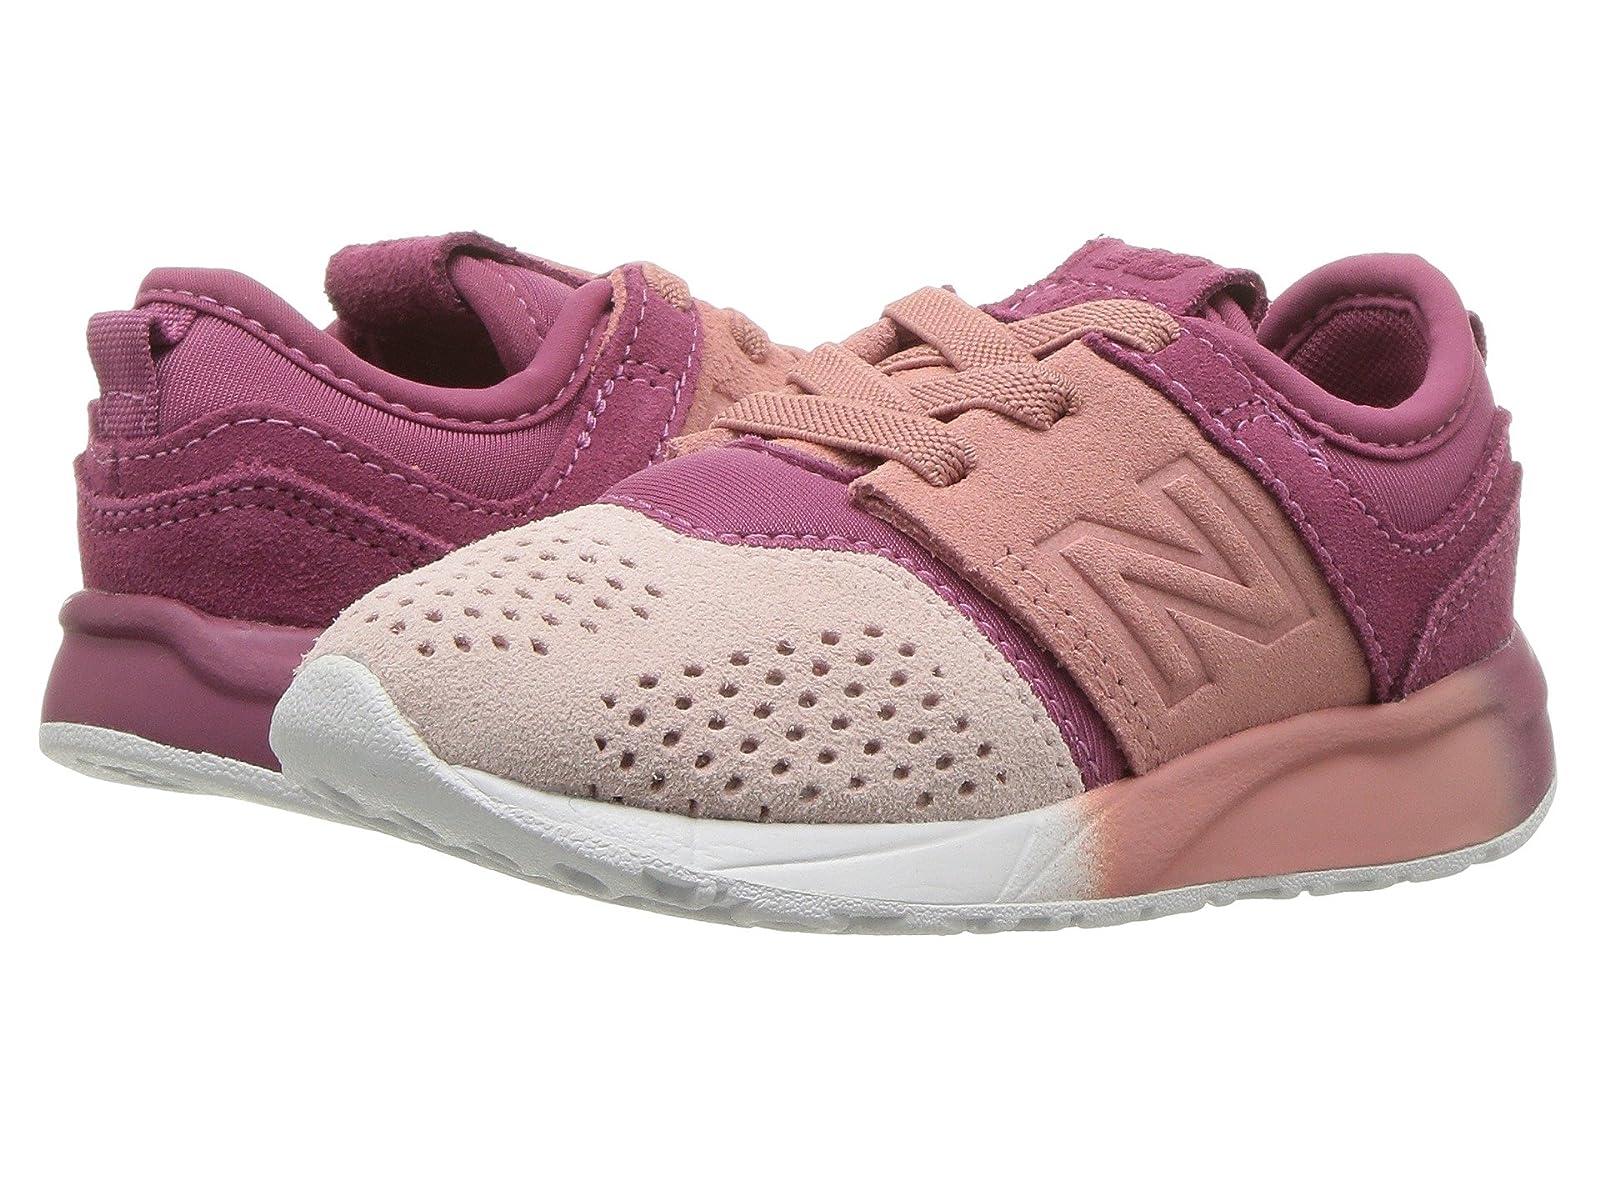 New Balance Kids KA247v1I (Infant/Toddler)Cheap and distinctive eye-catching shoes